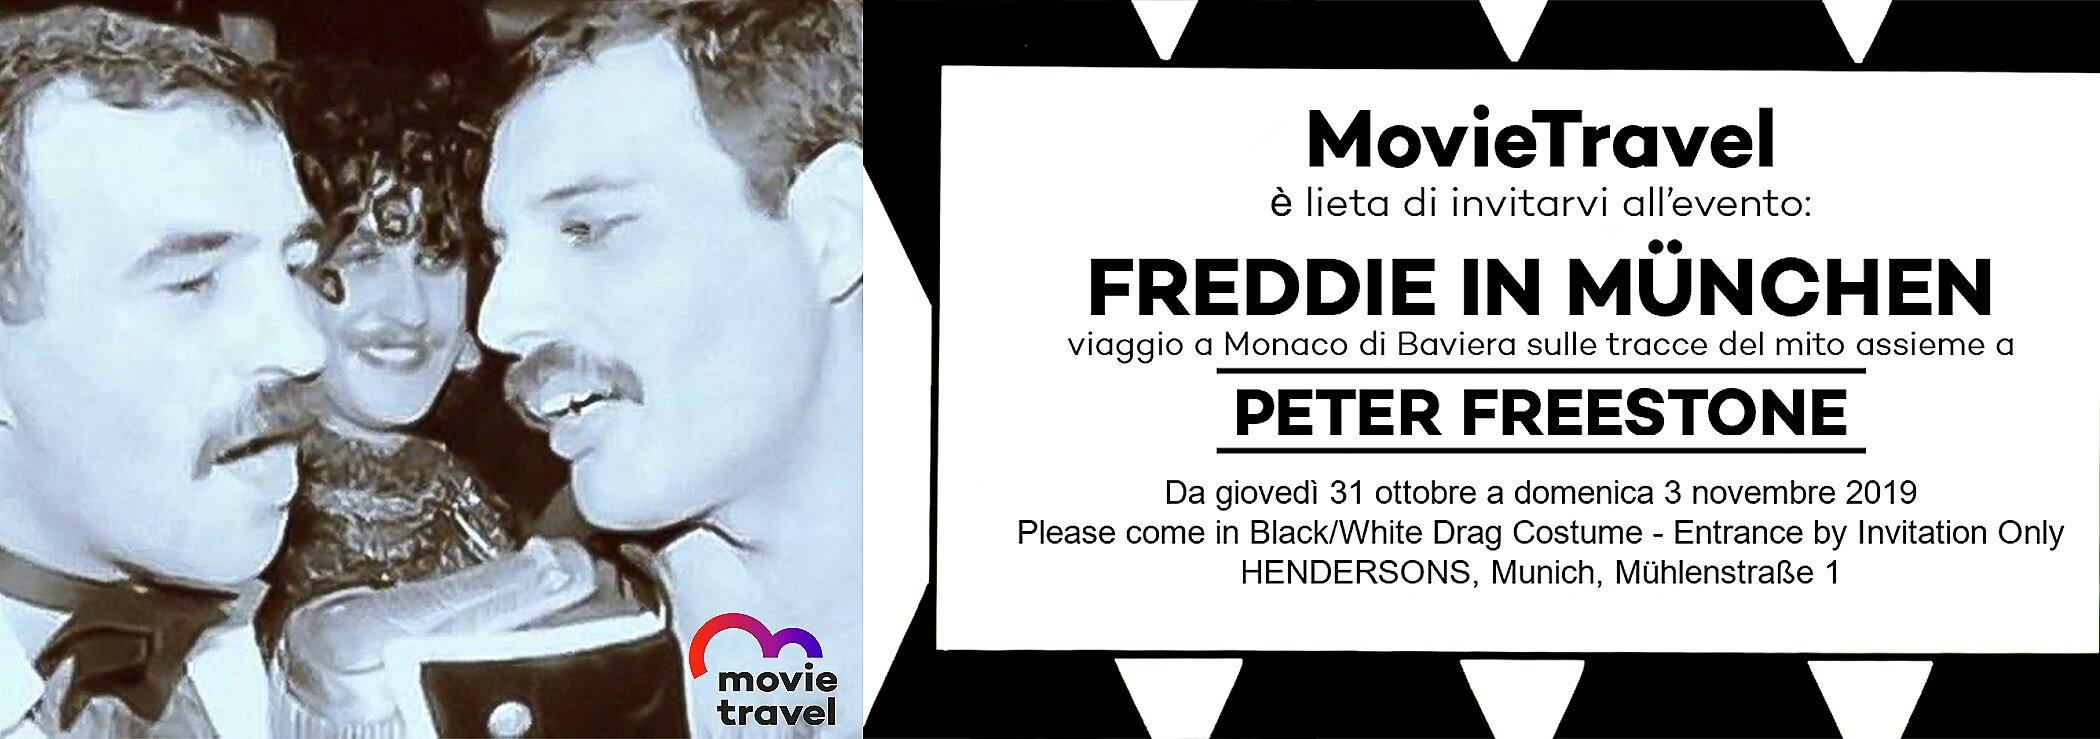 FREDDIE+A+MONACO.jpg